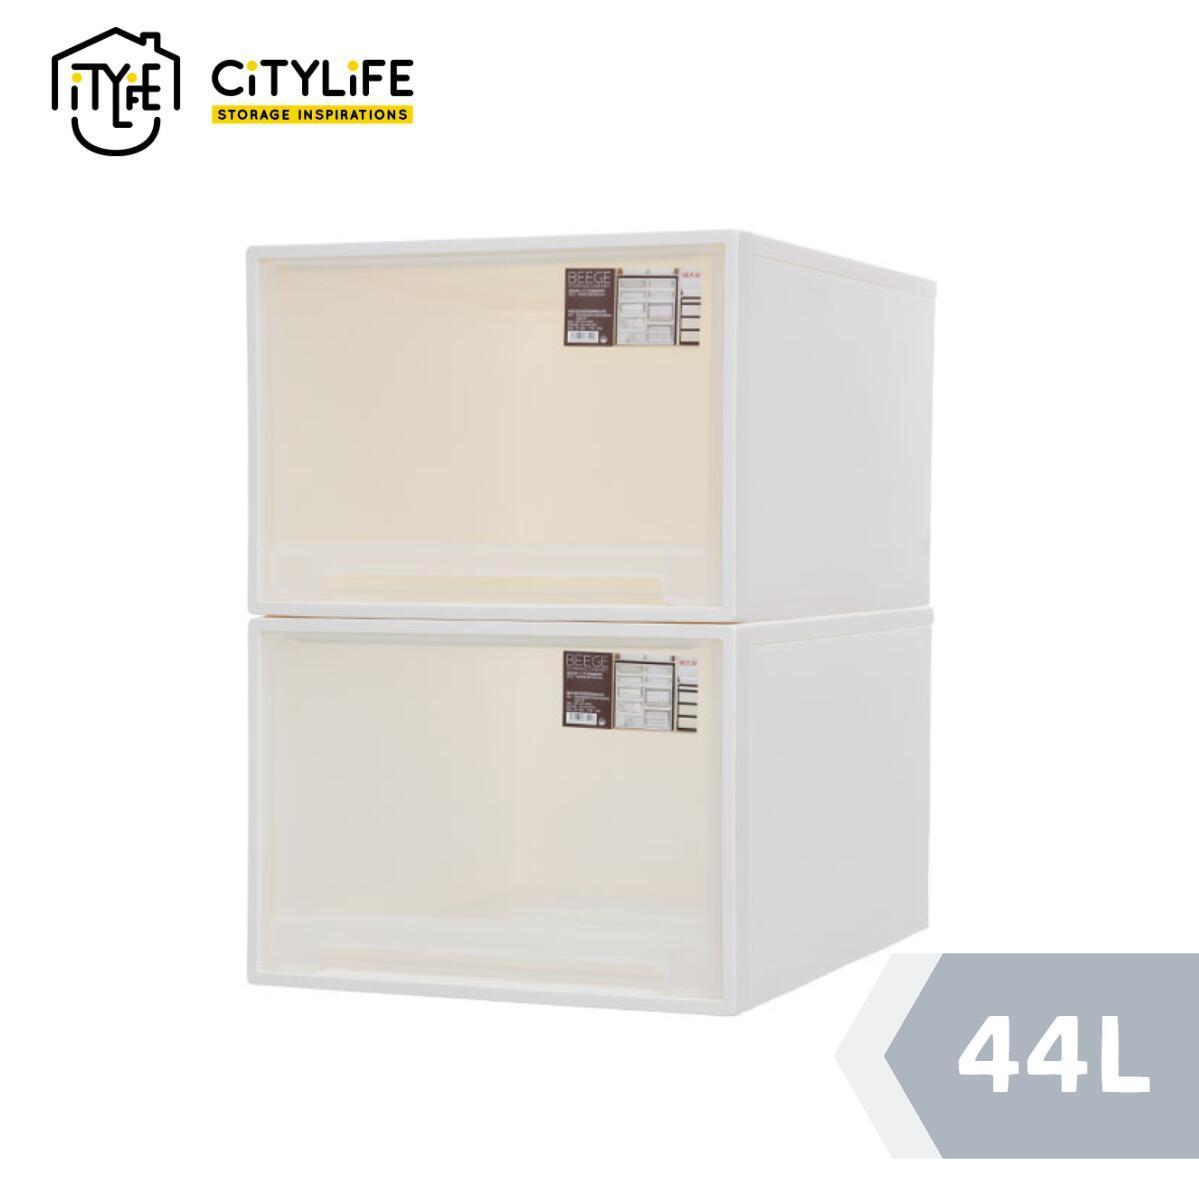 [Bundle of 2] Citylife Beege Single Tier Drawer 44L